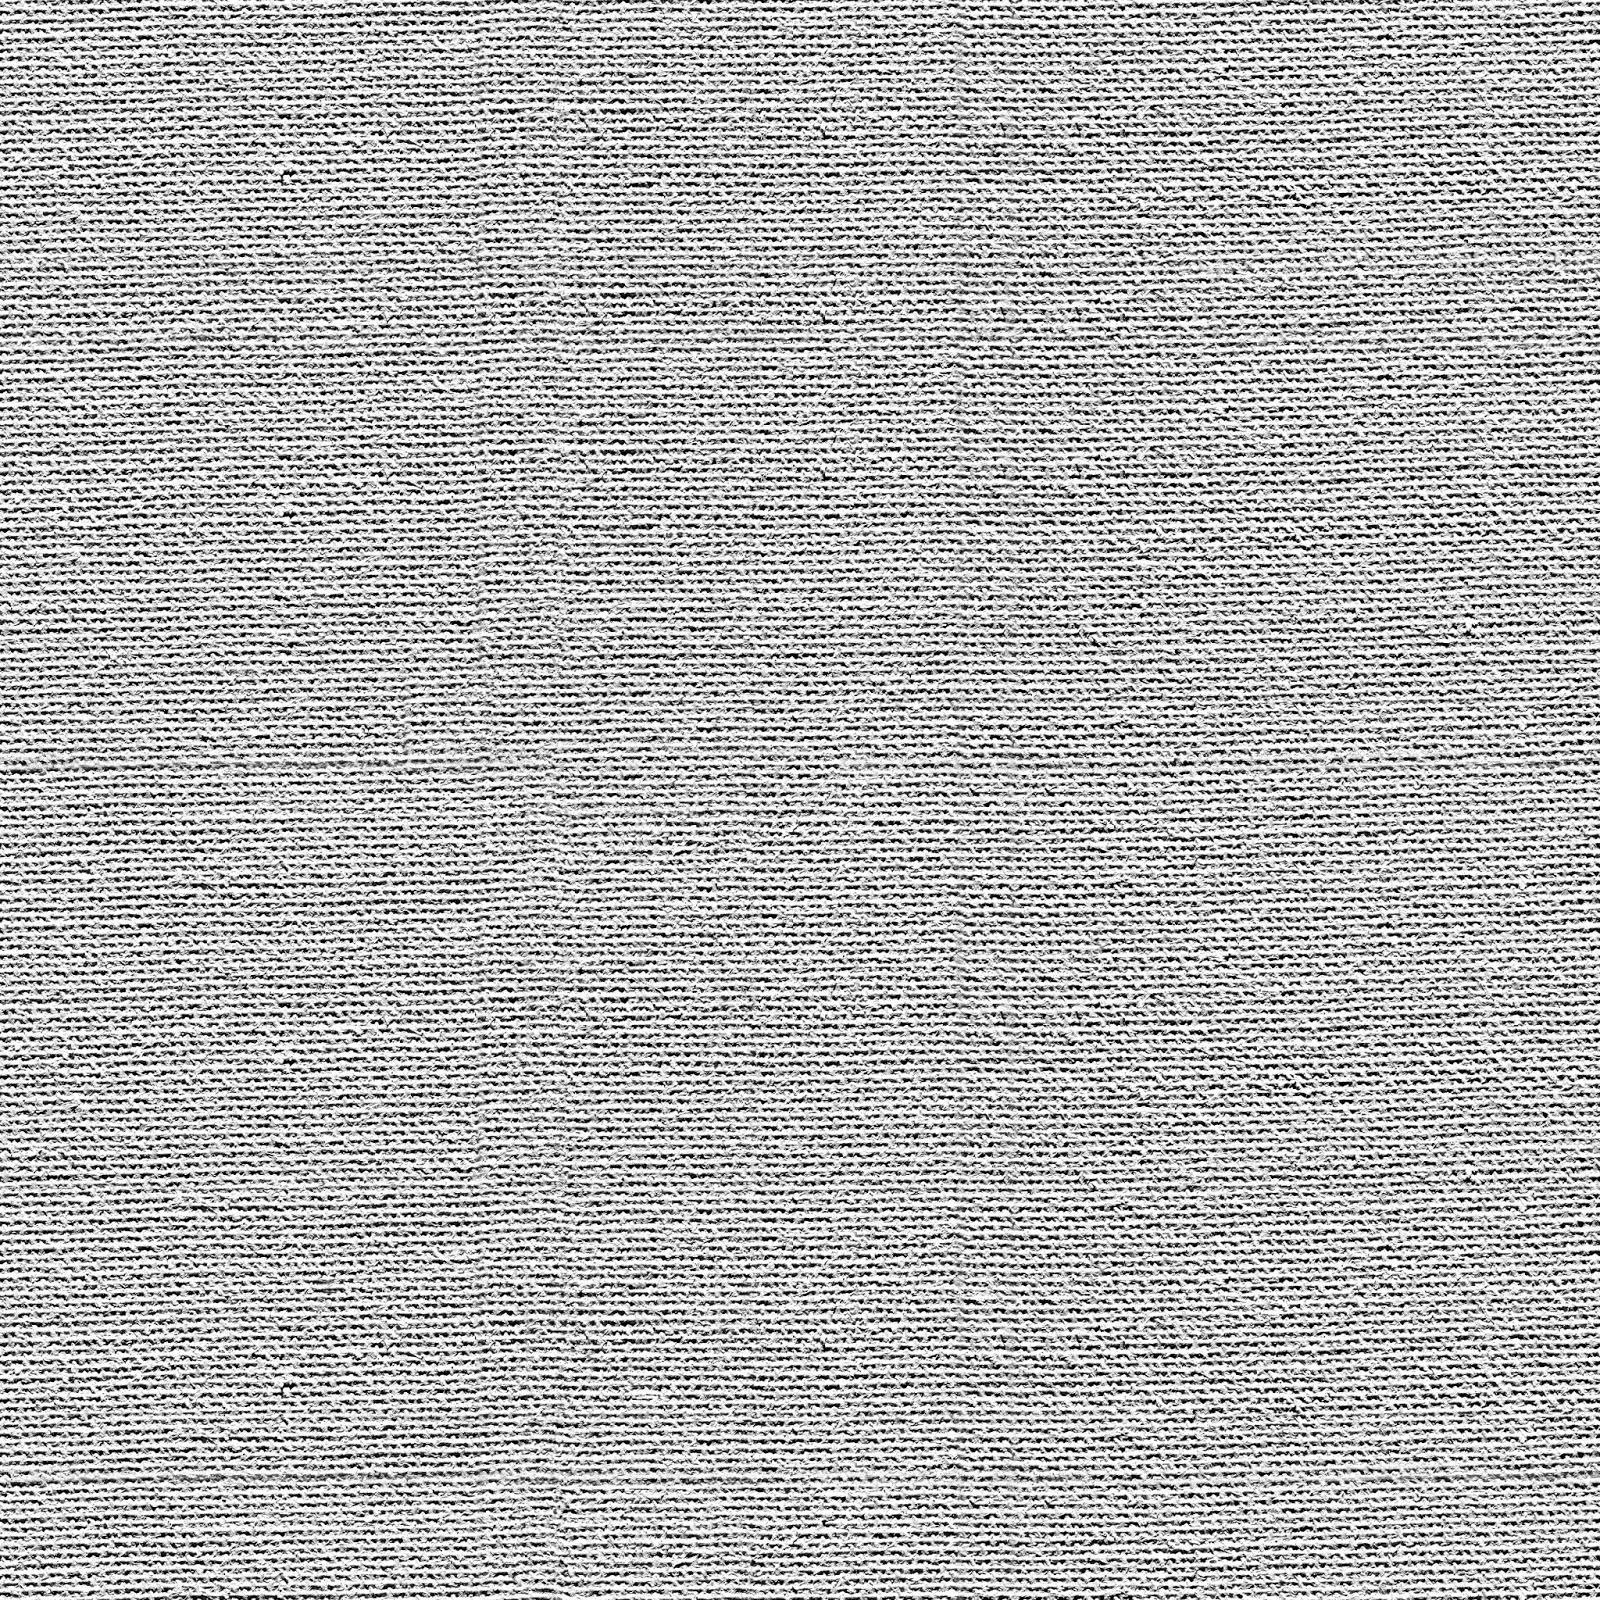 Maxwell 3D Resources: Free 3D Textures: Cloths, Bricks